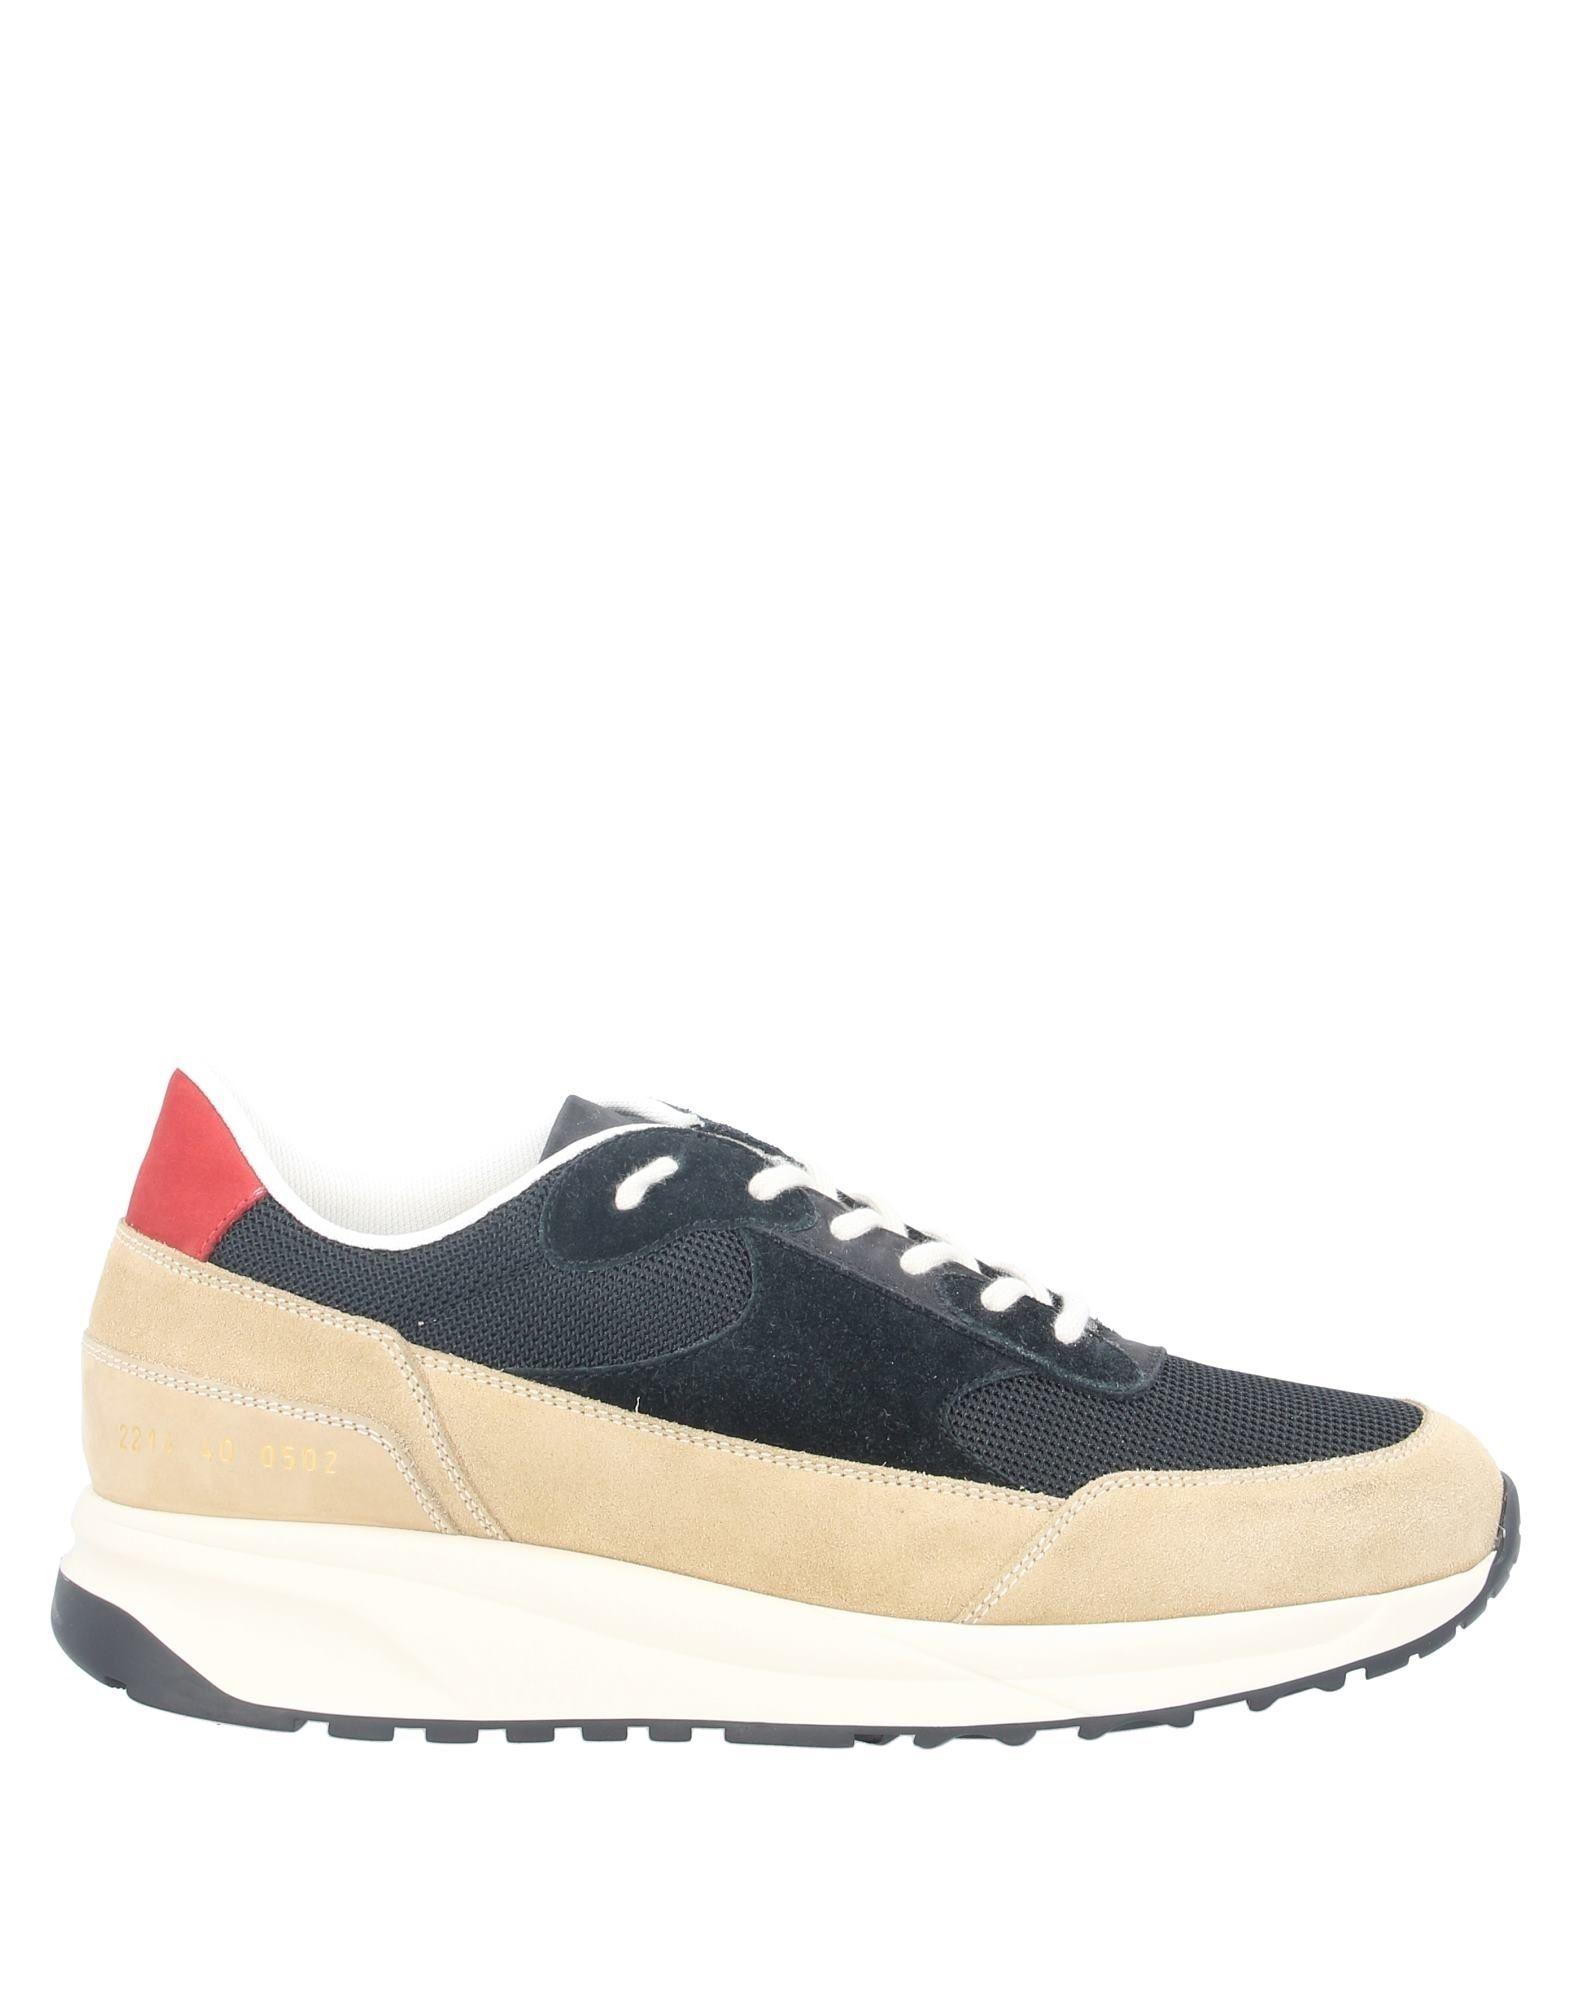 COMMON PROJECTS Низкие кеды и кроссовки common projects обувь на шнурках